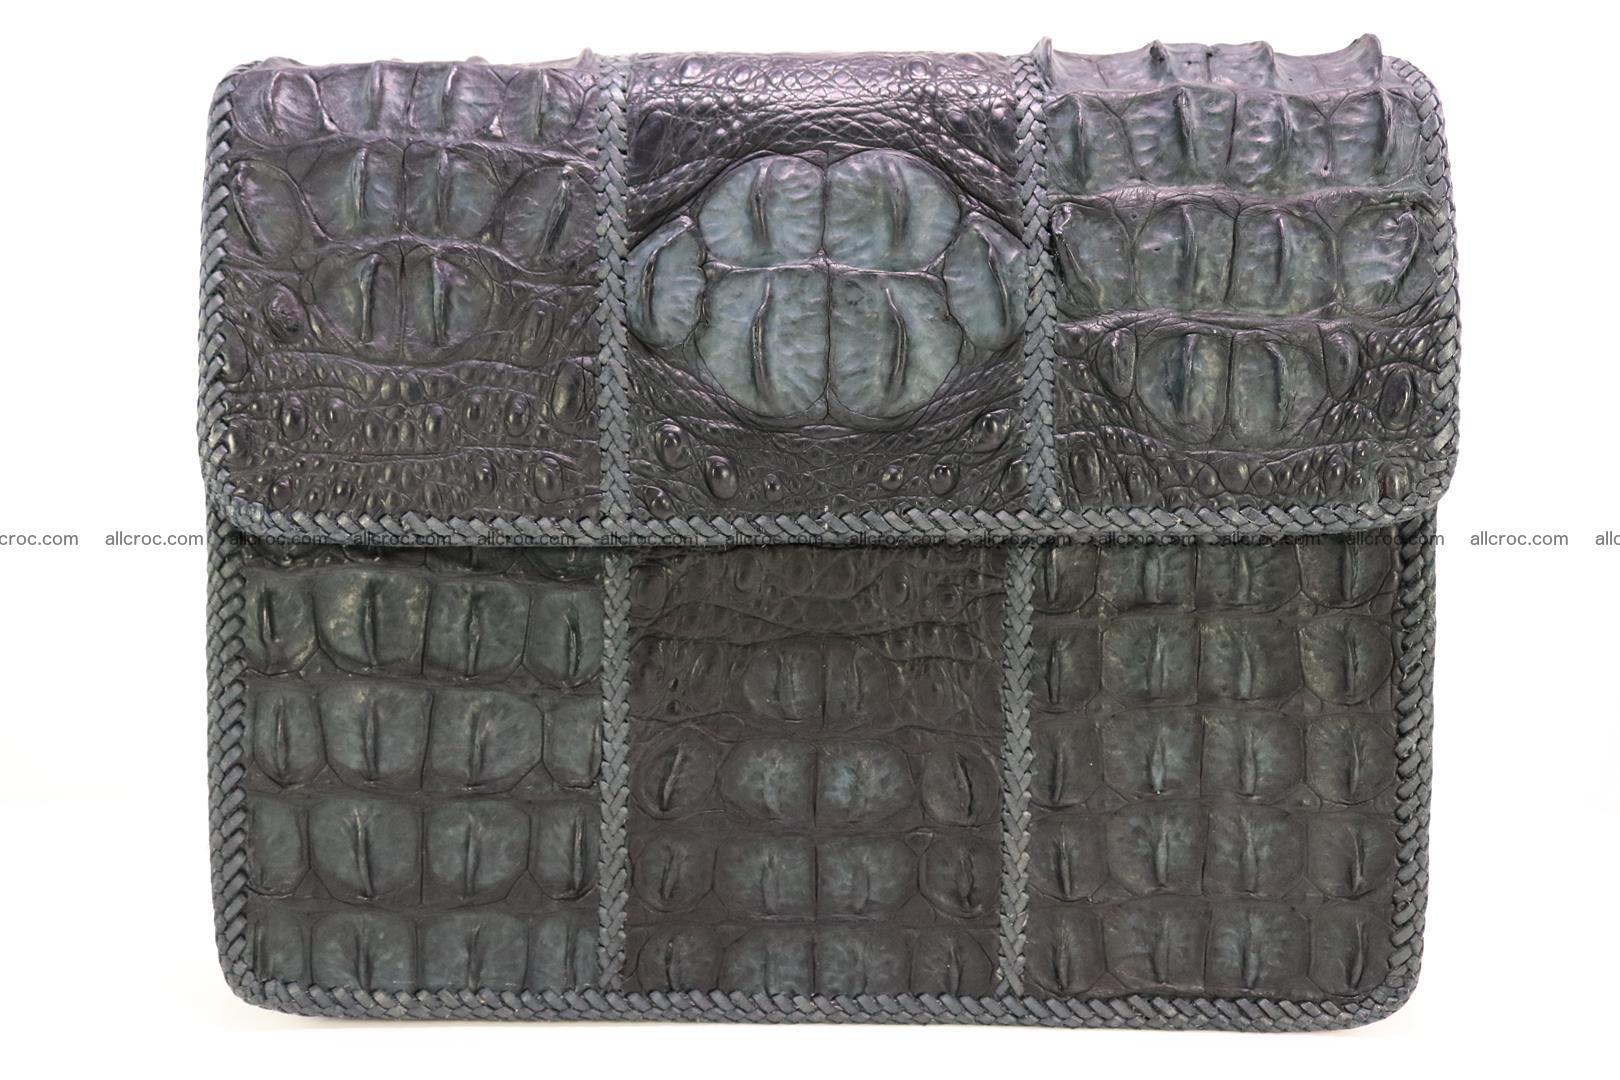 Crocodile skin shoulder bag with braided edges 146 Foto 0